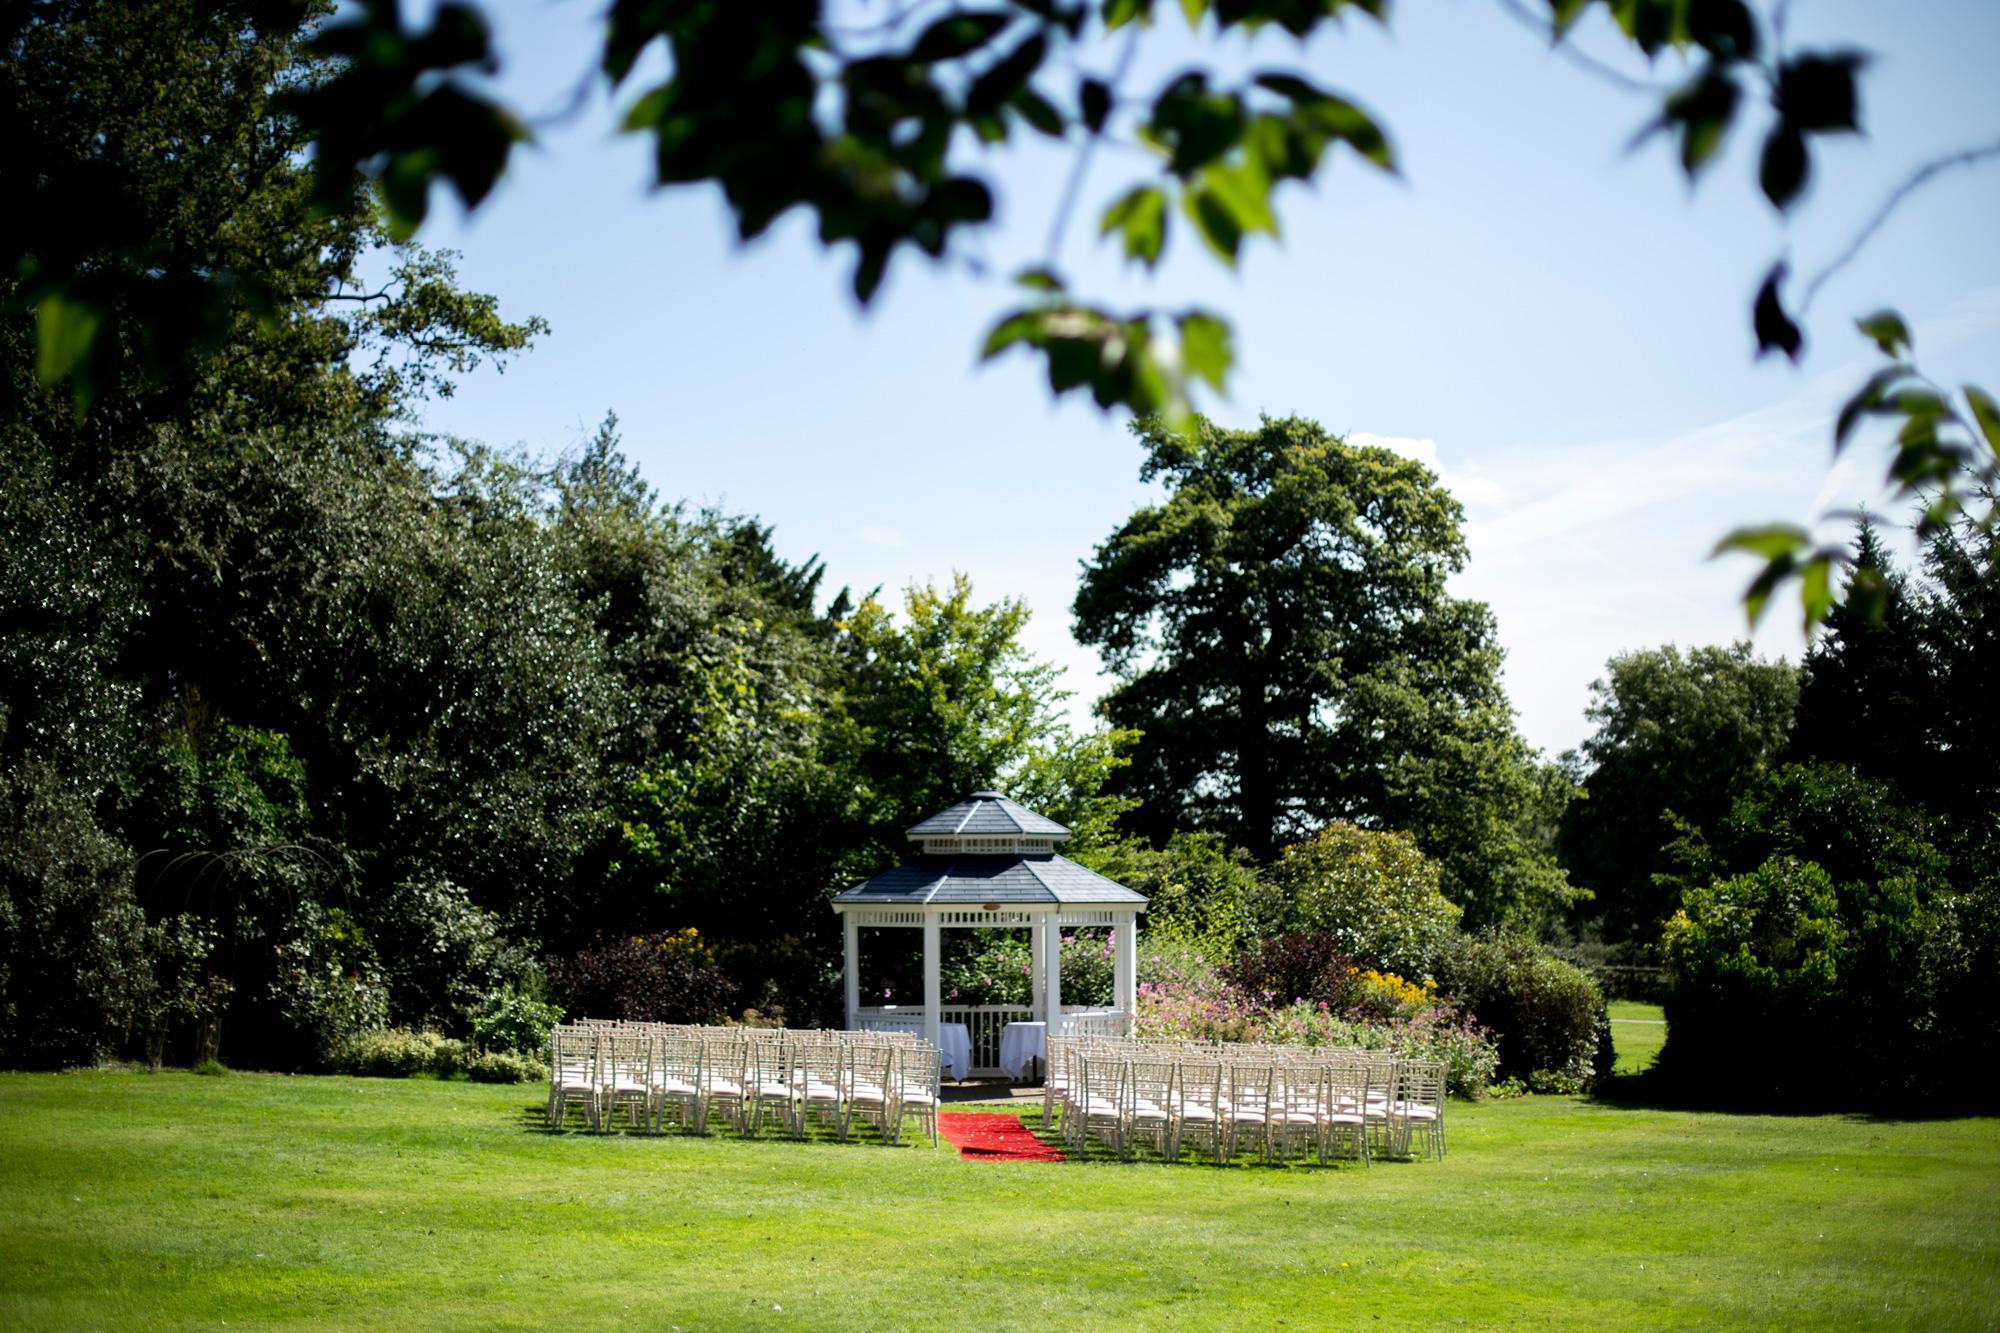 outdoor wedding venue in bedfordshire.jpg